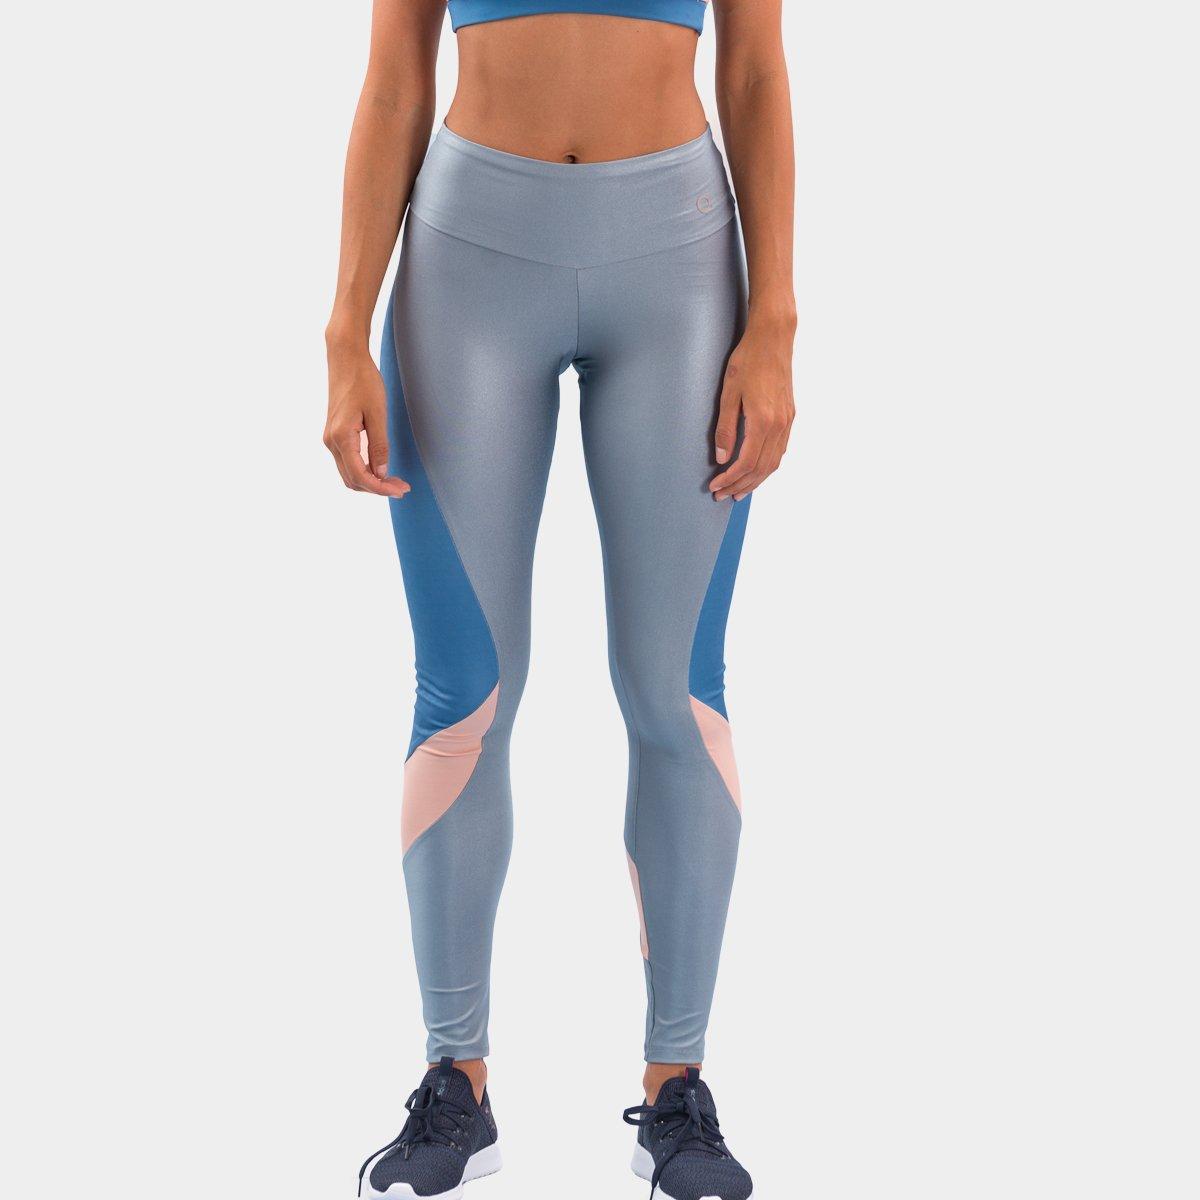 Calça Legging Área Sports Load Feminina - Tam: GG